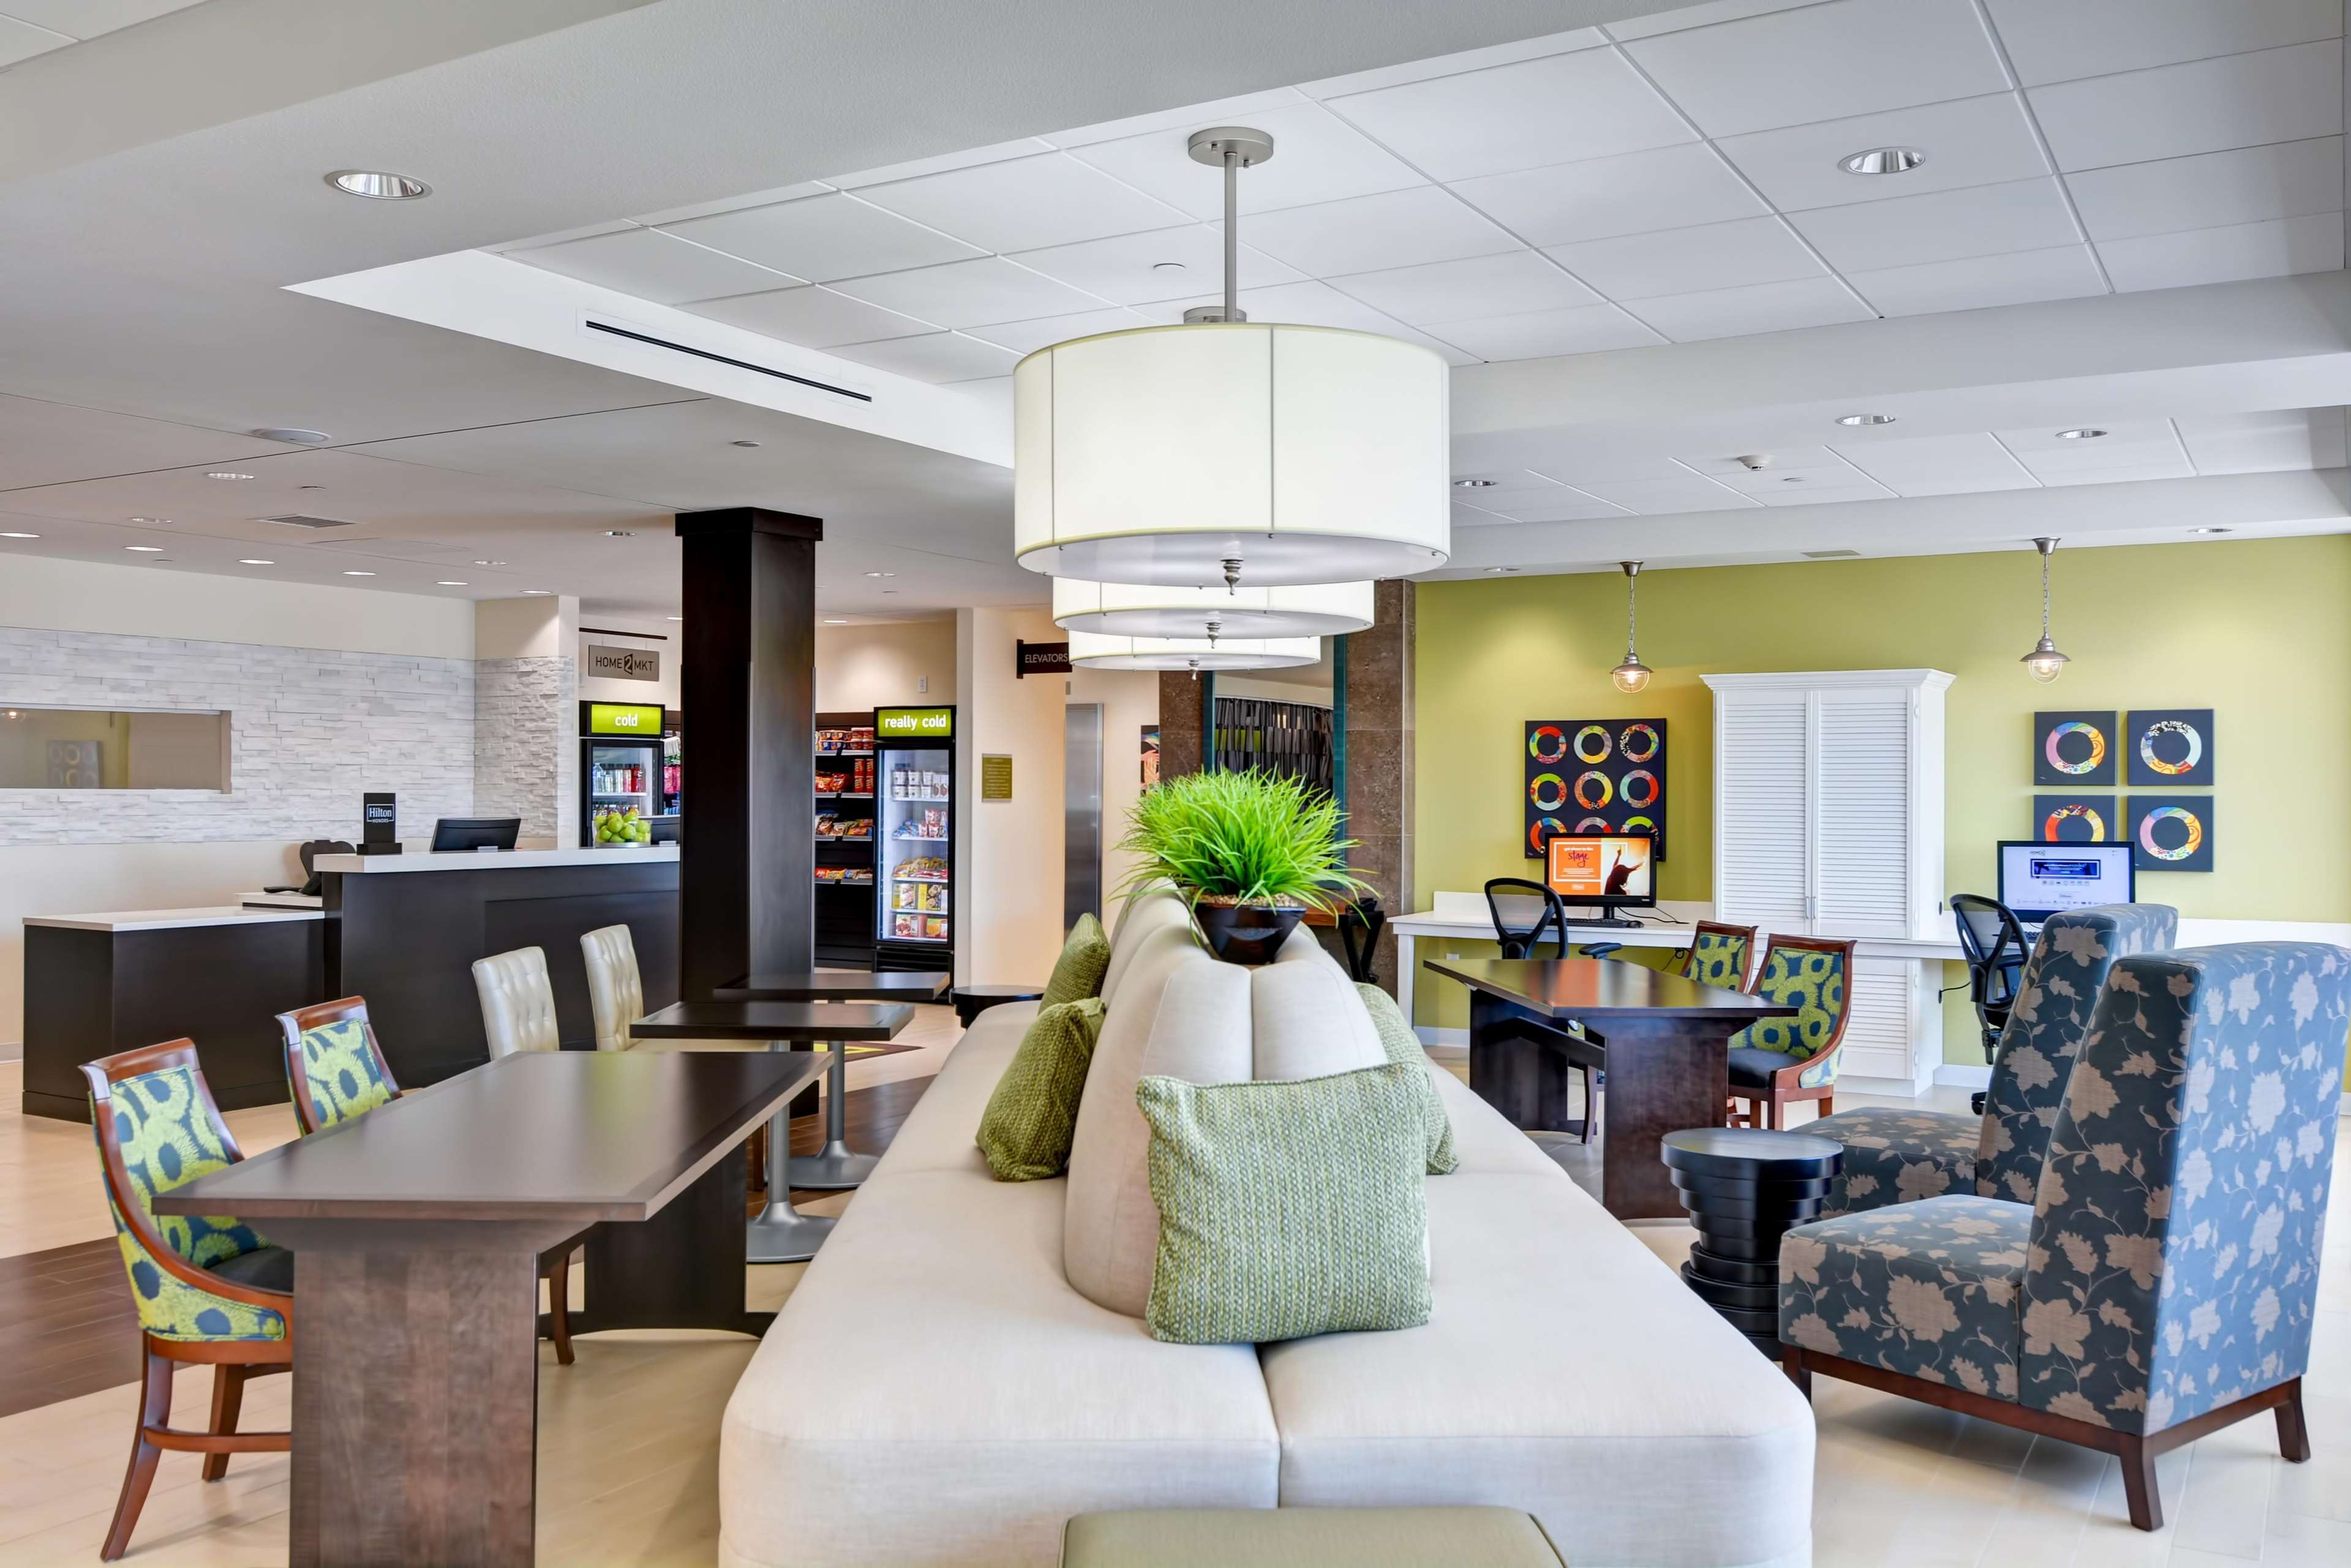 Home2 Suites by Hilton Azusa image 36